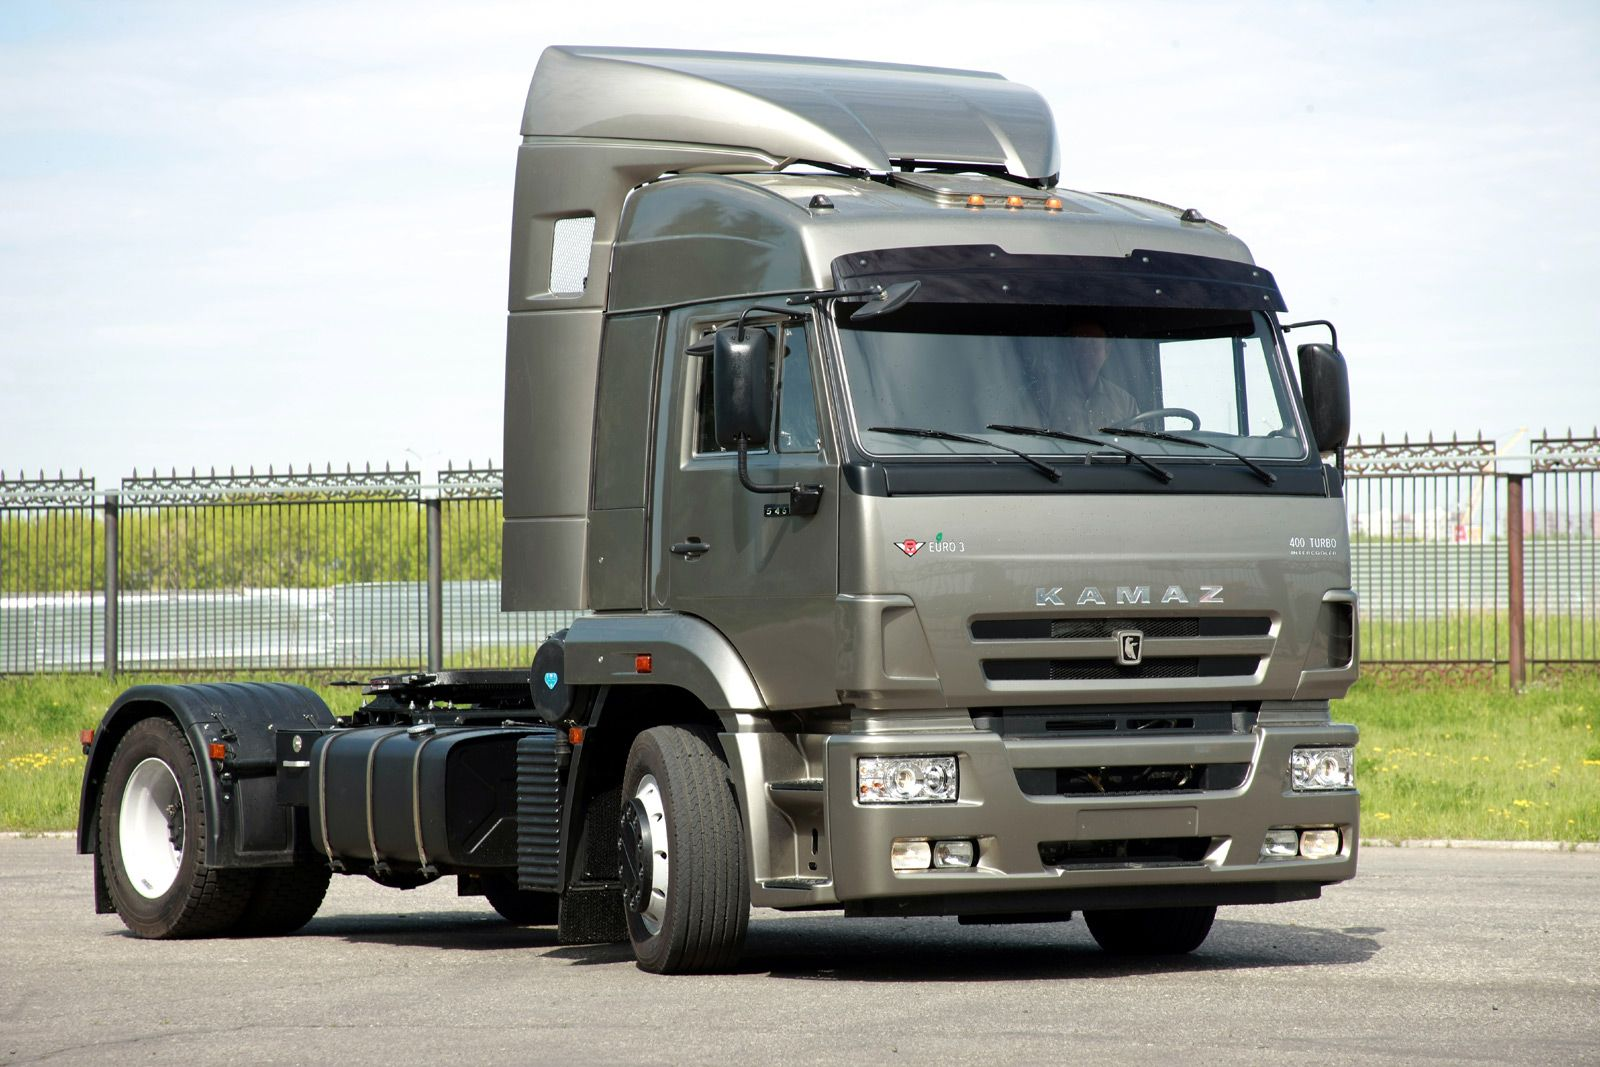 kamaz 5460 new kamaz trucks cars commercial vehicle rh pinterest com